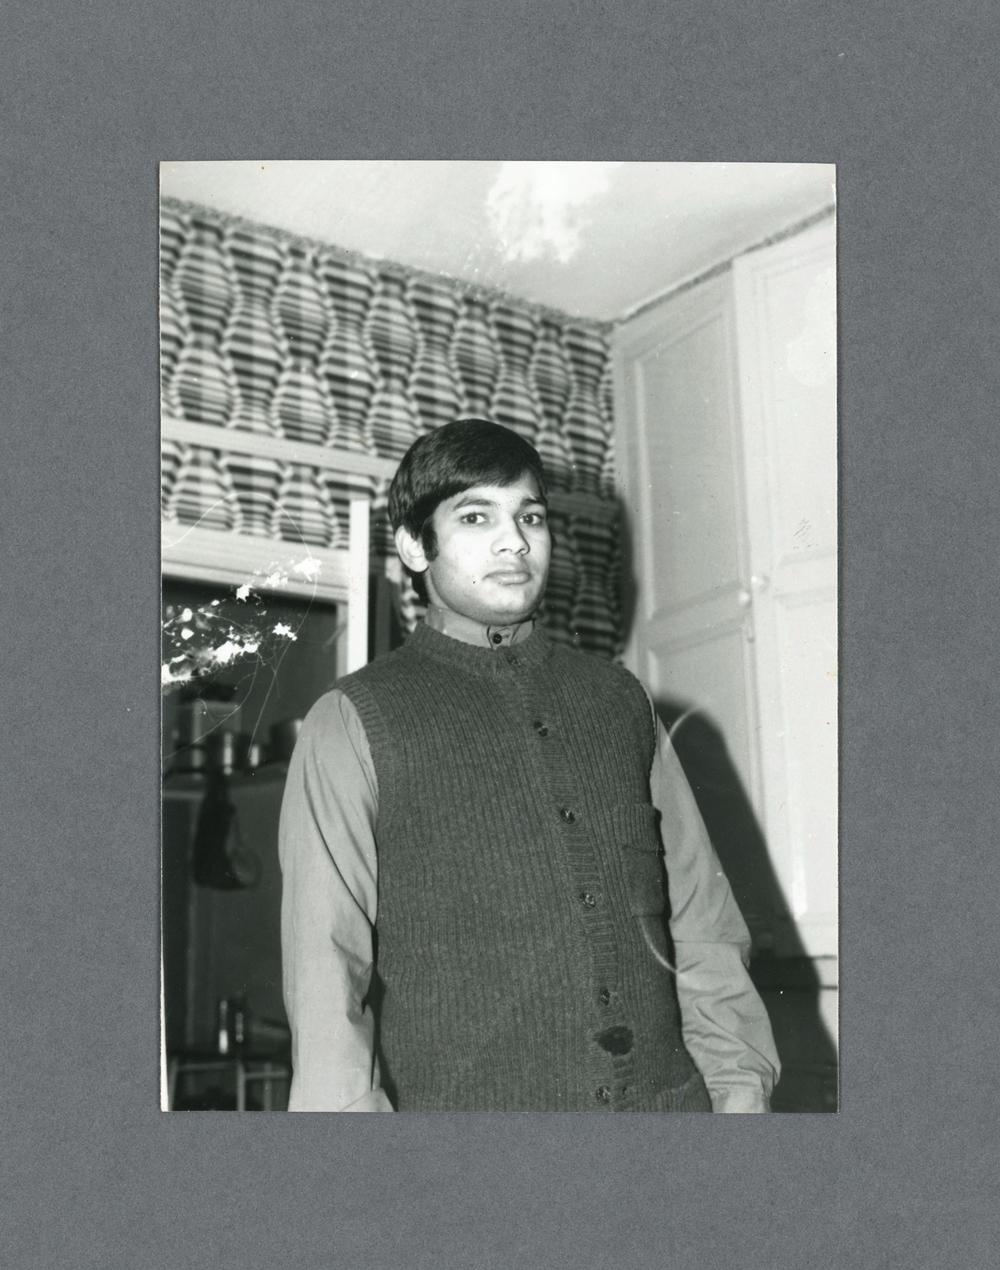 Willenhall Rd. c.1972